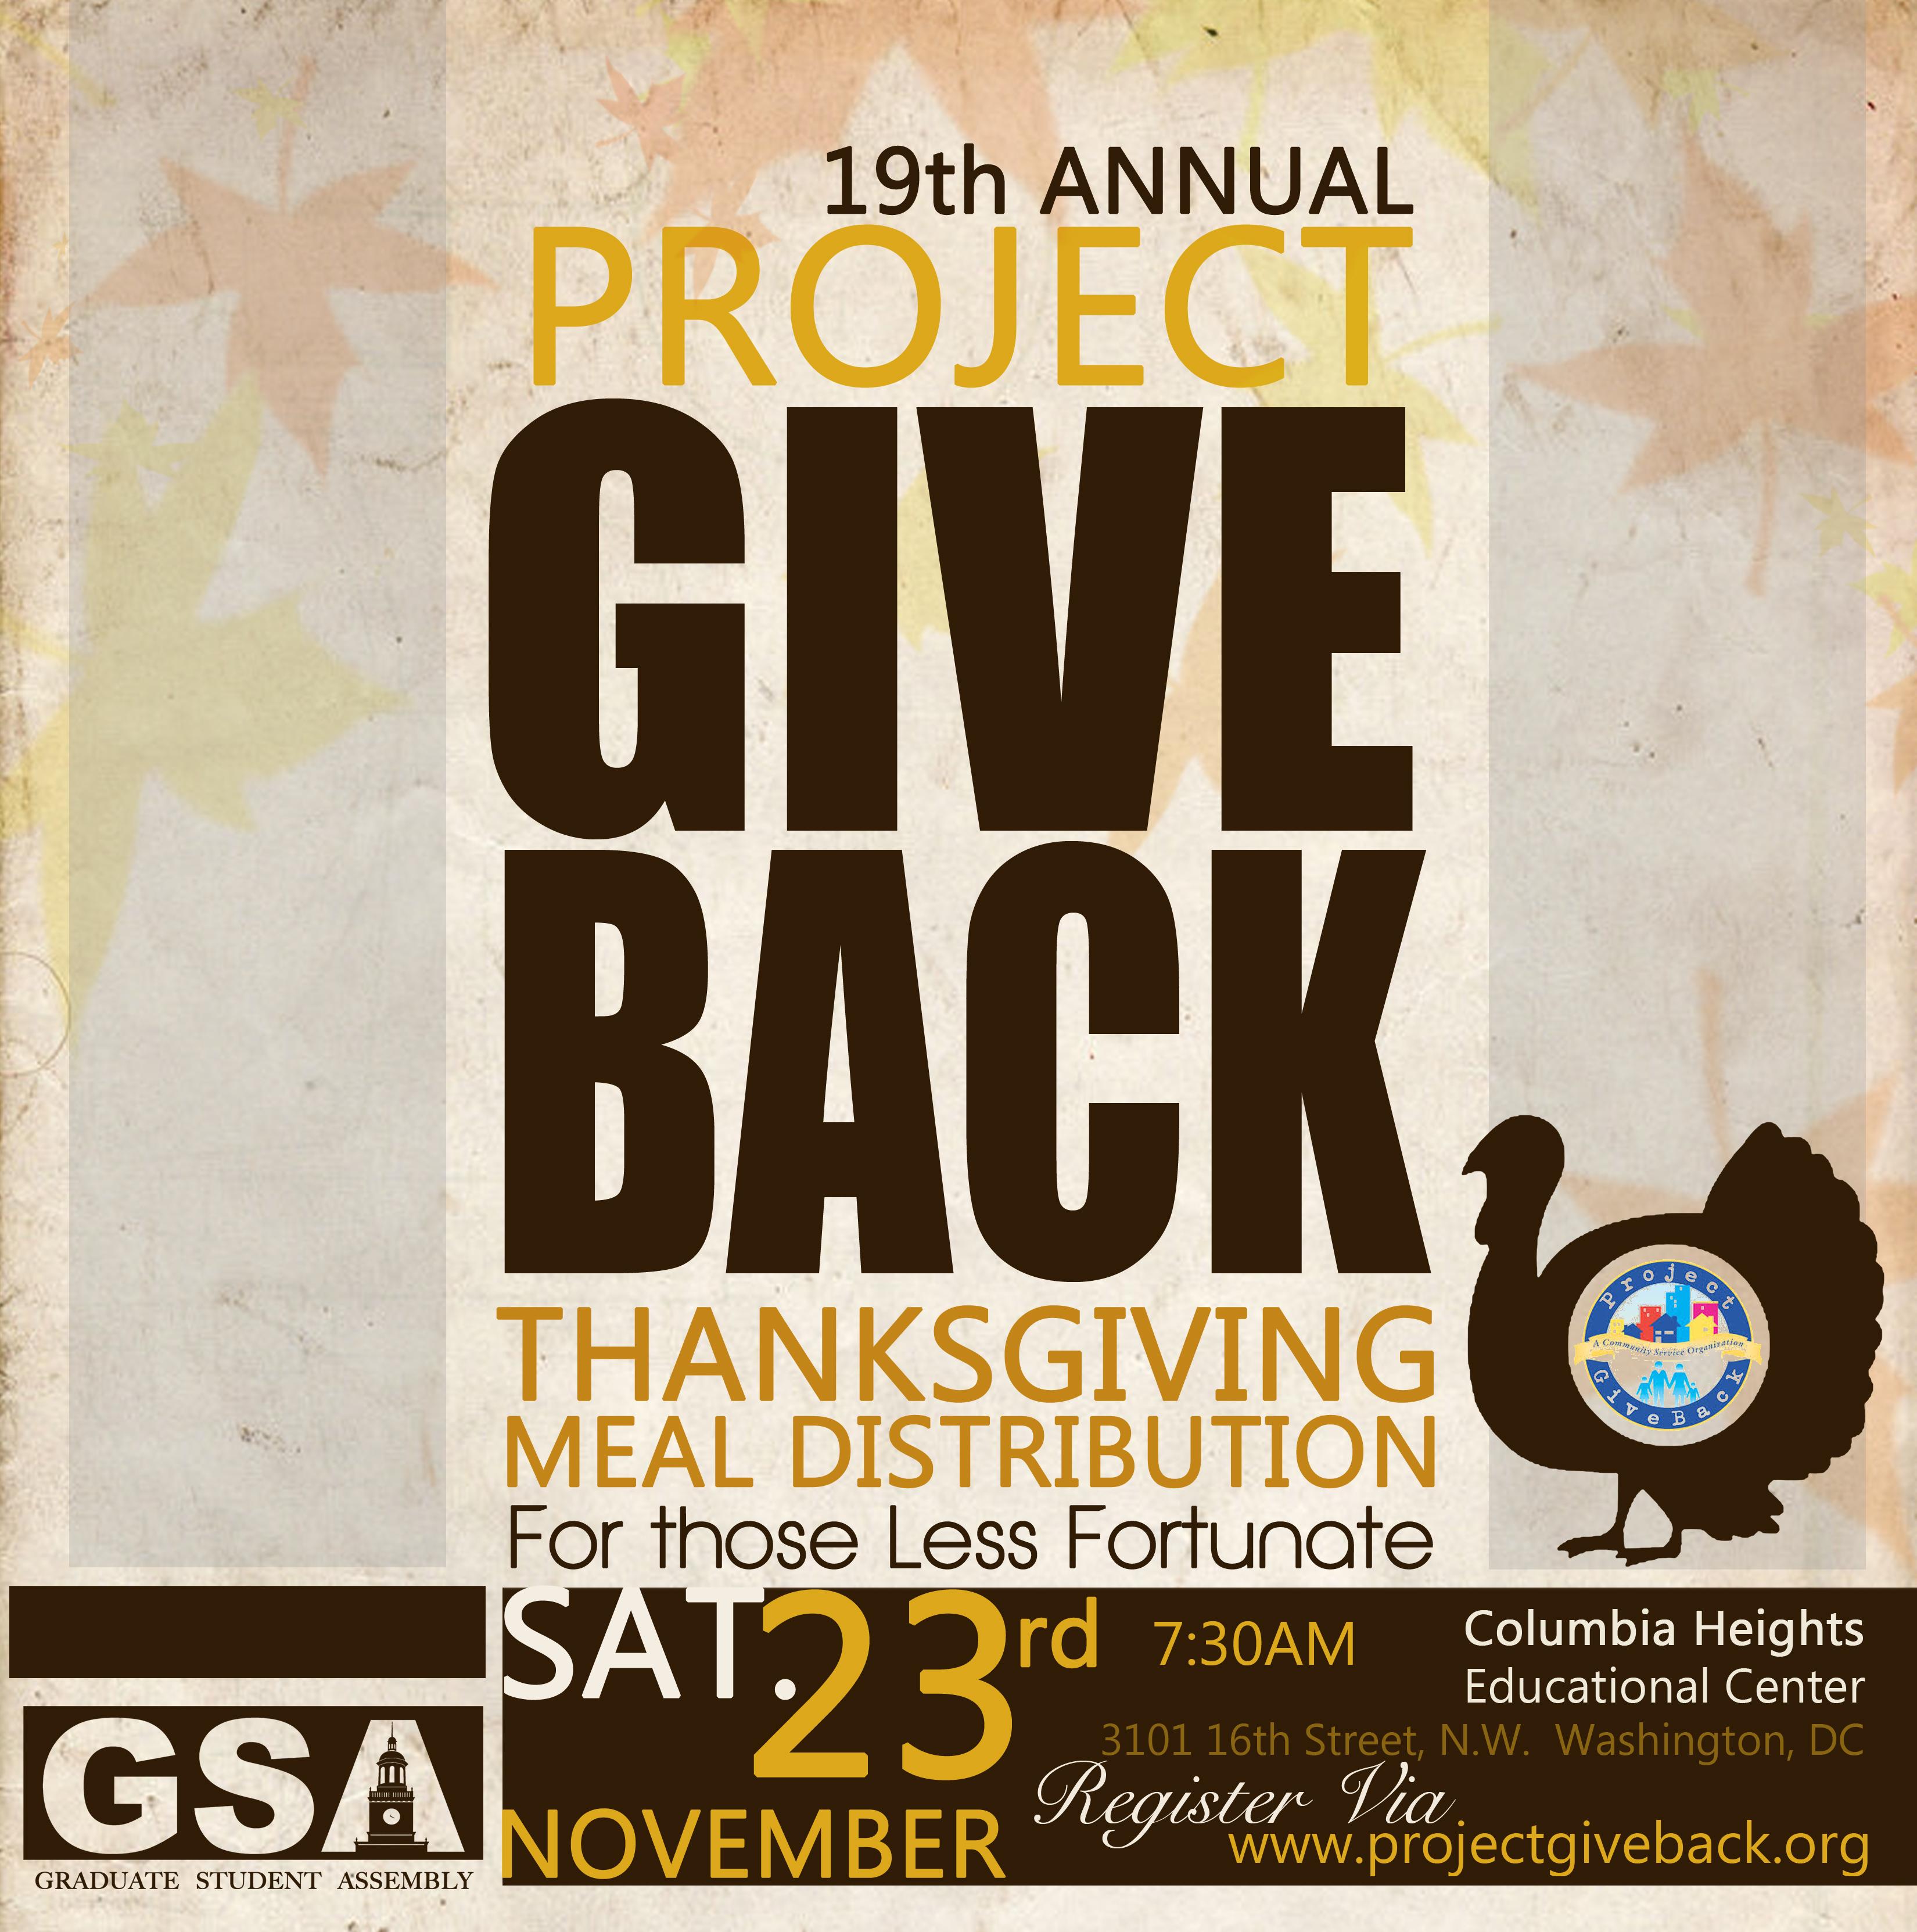 Non Profit - Project Giveback